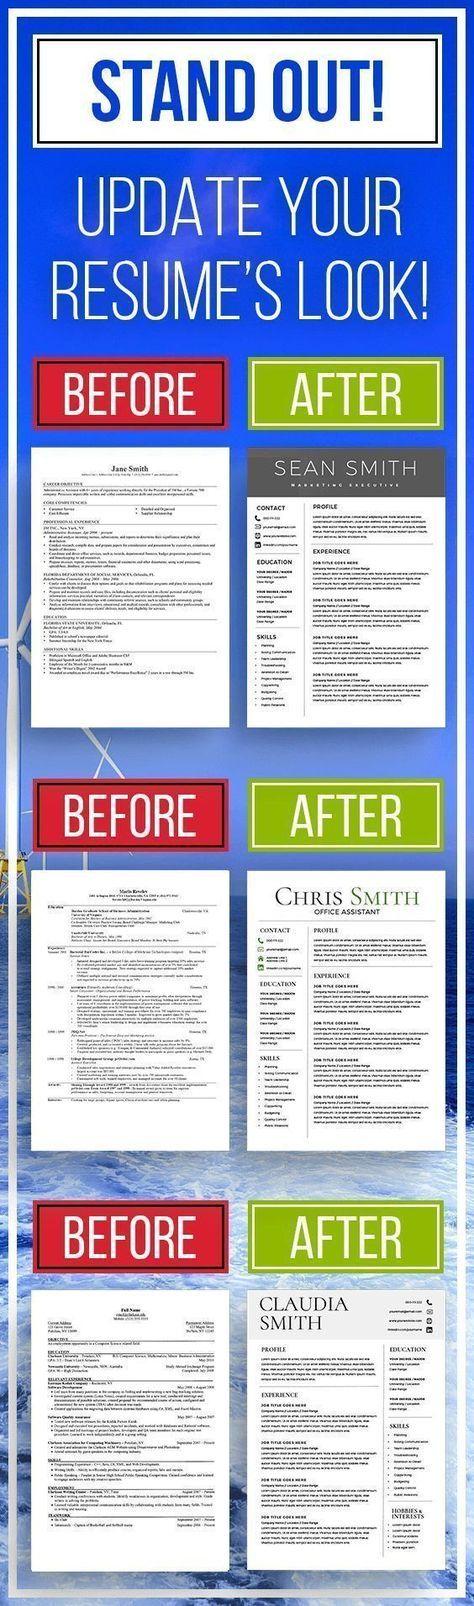 Best 25+ Upload cv ideas on Pinterest Green nature, Prayer plant - updating my resume